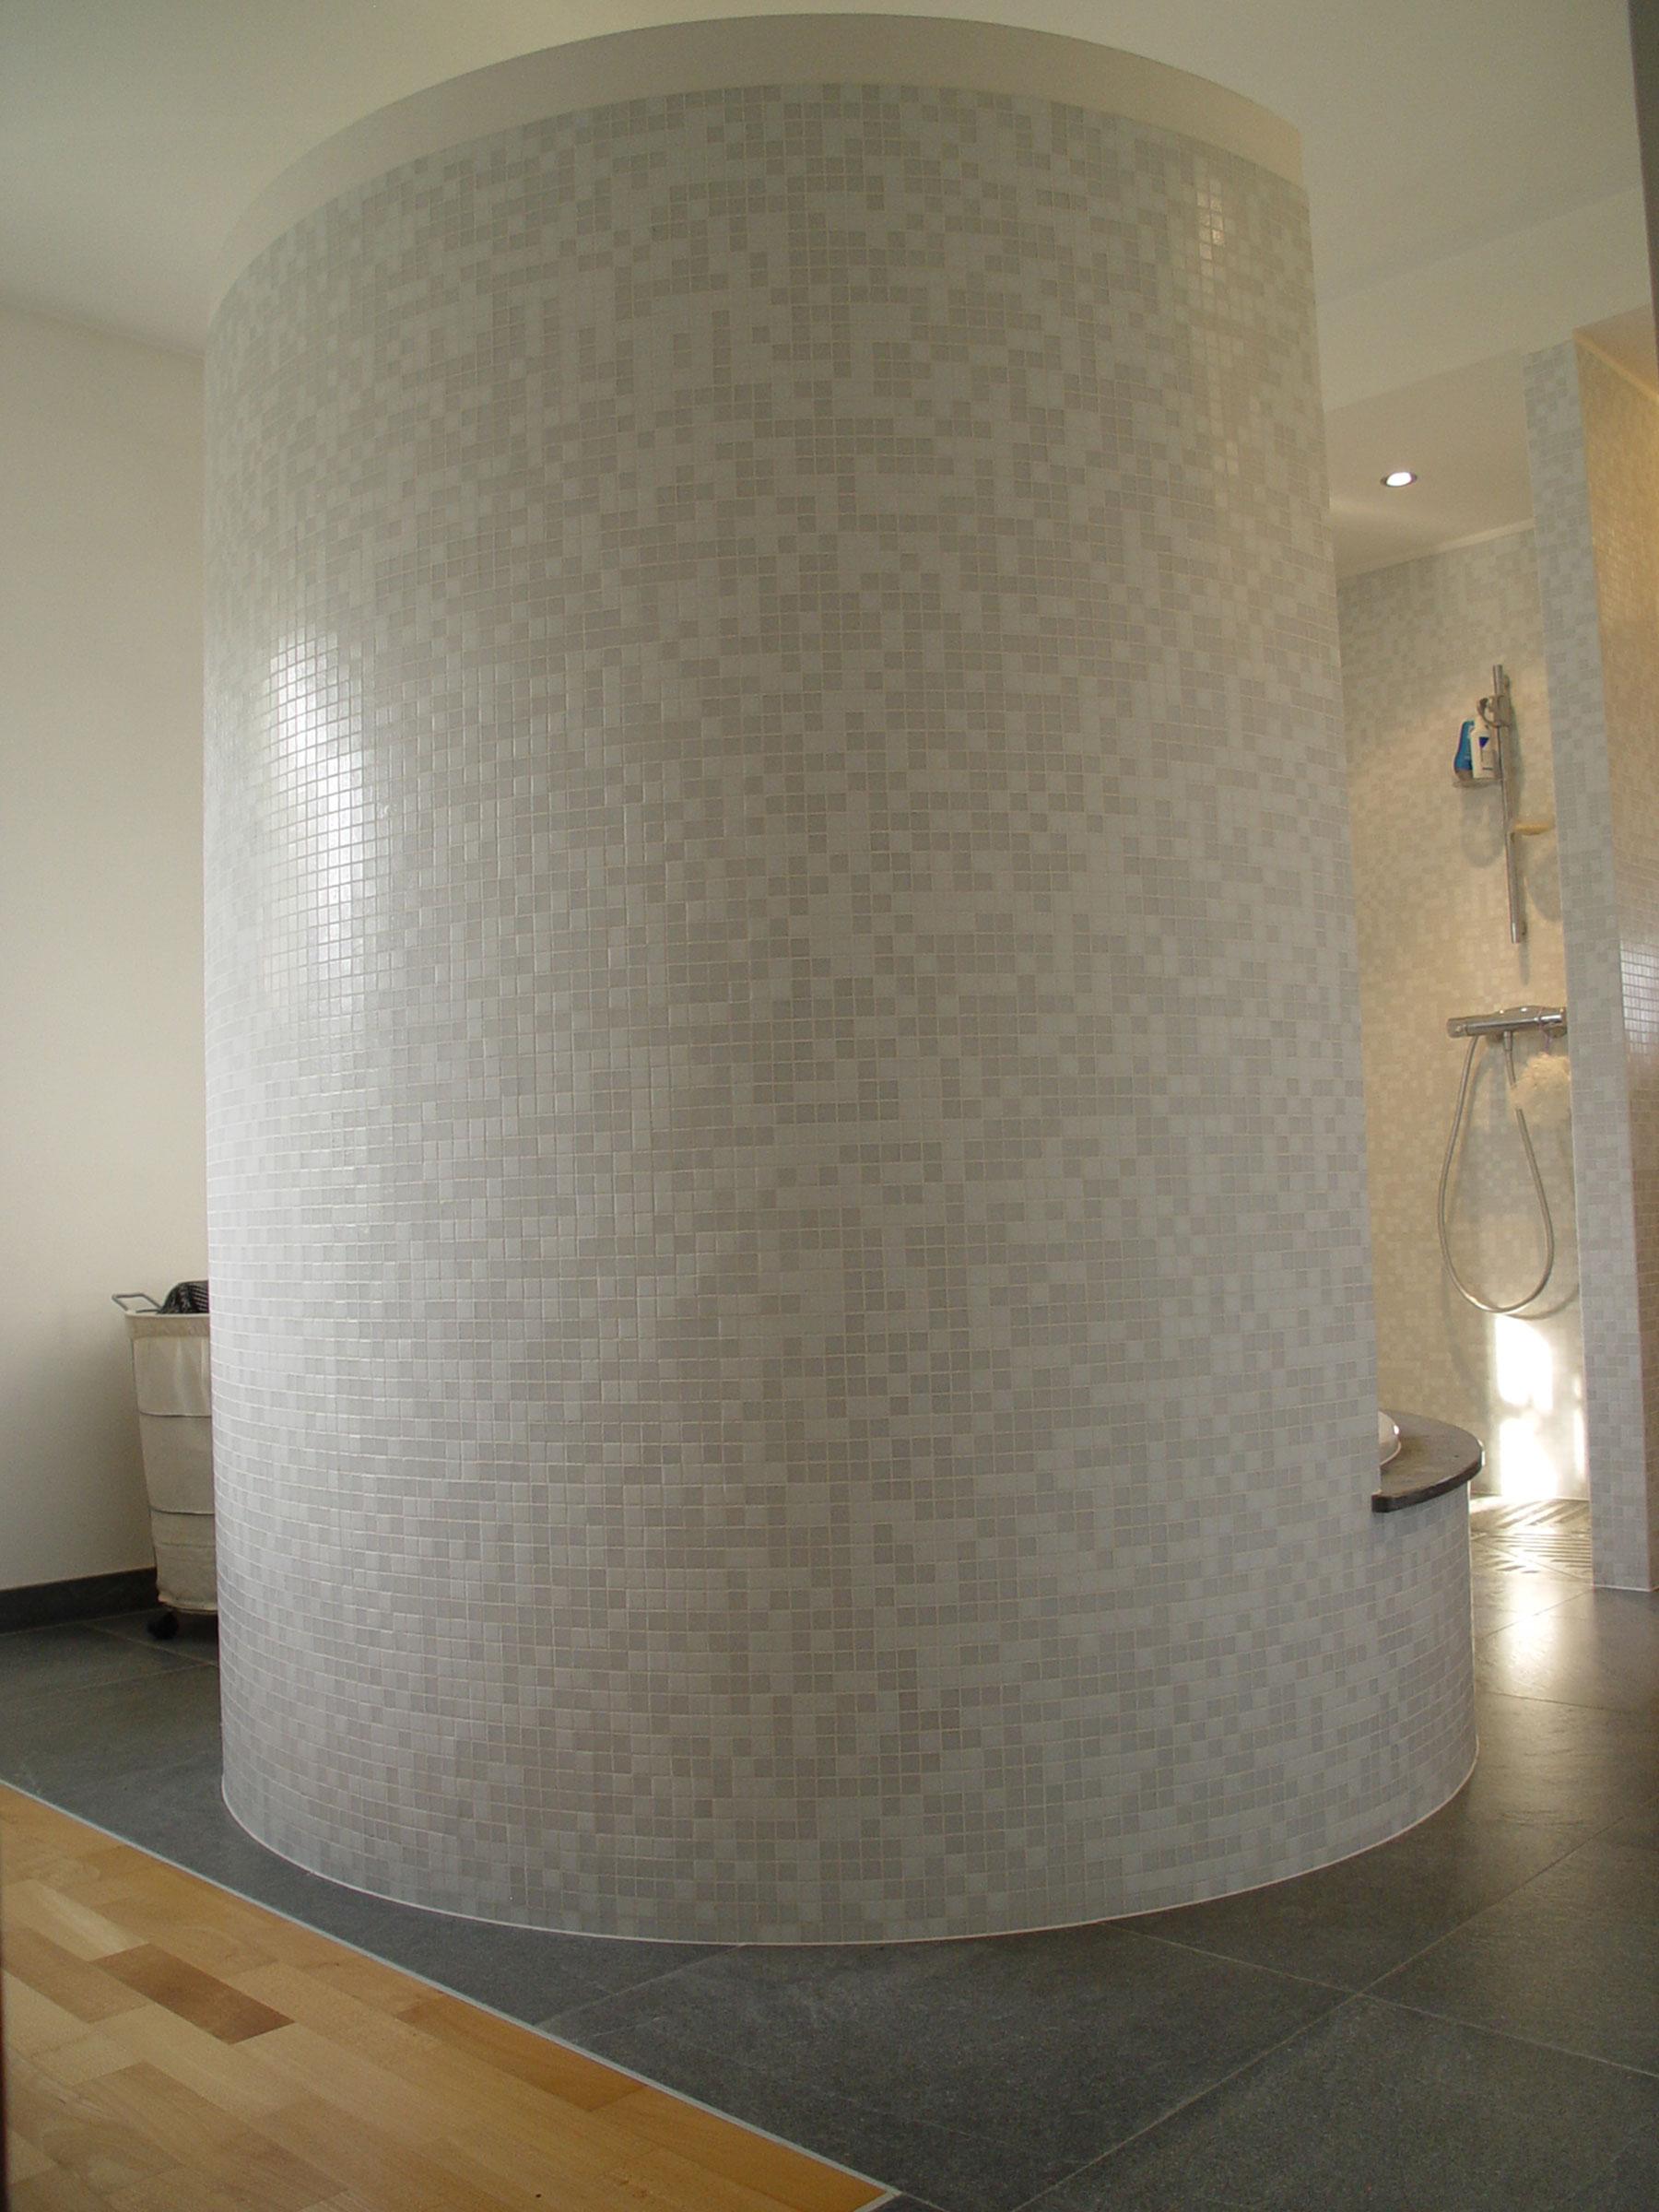 Salle de bain mur en verre douche l 39 italienne 12 mod for Mur en verre salle de bain